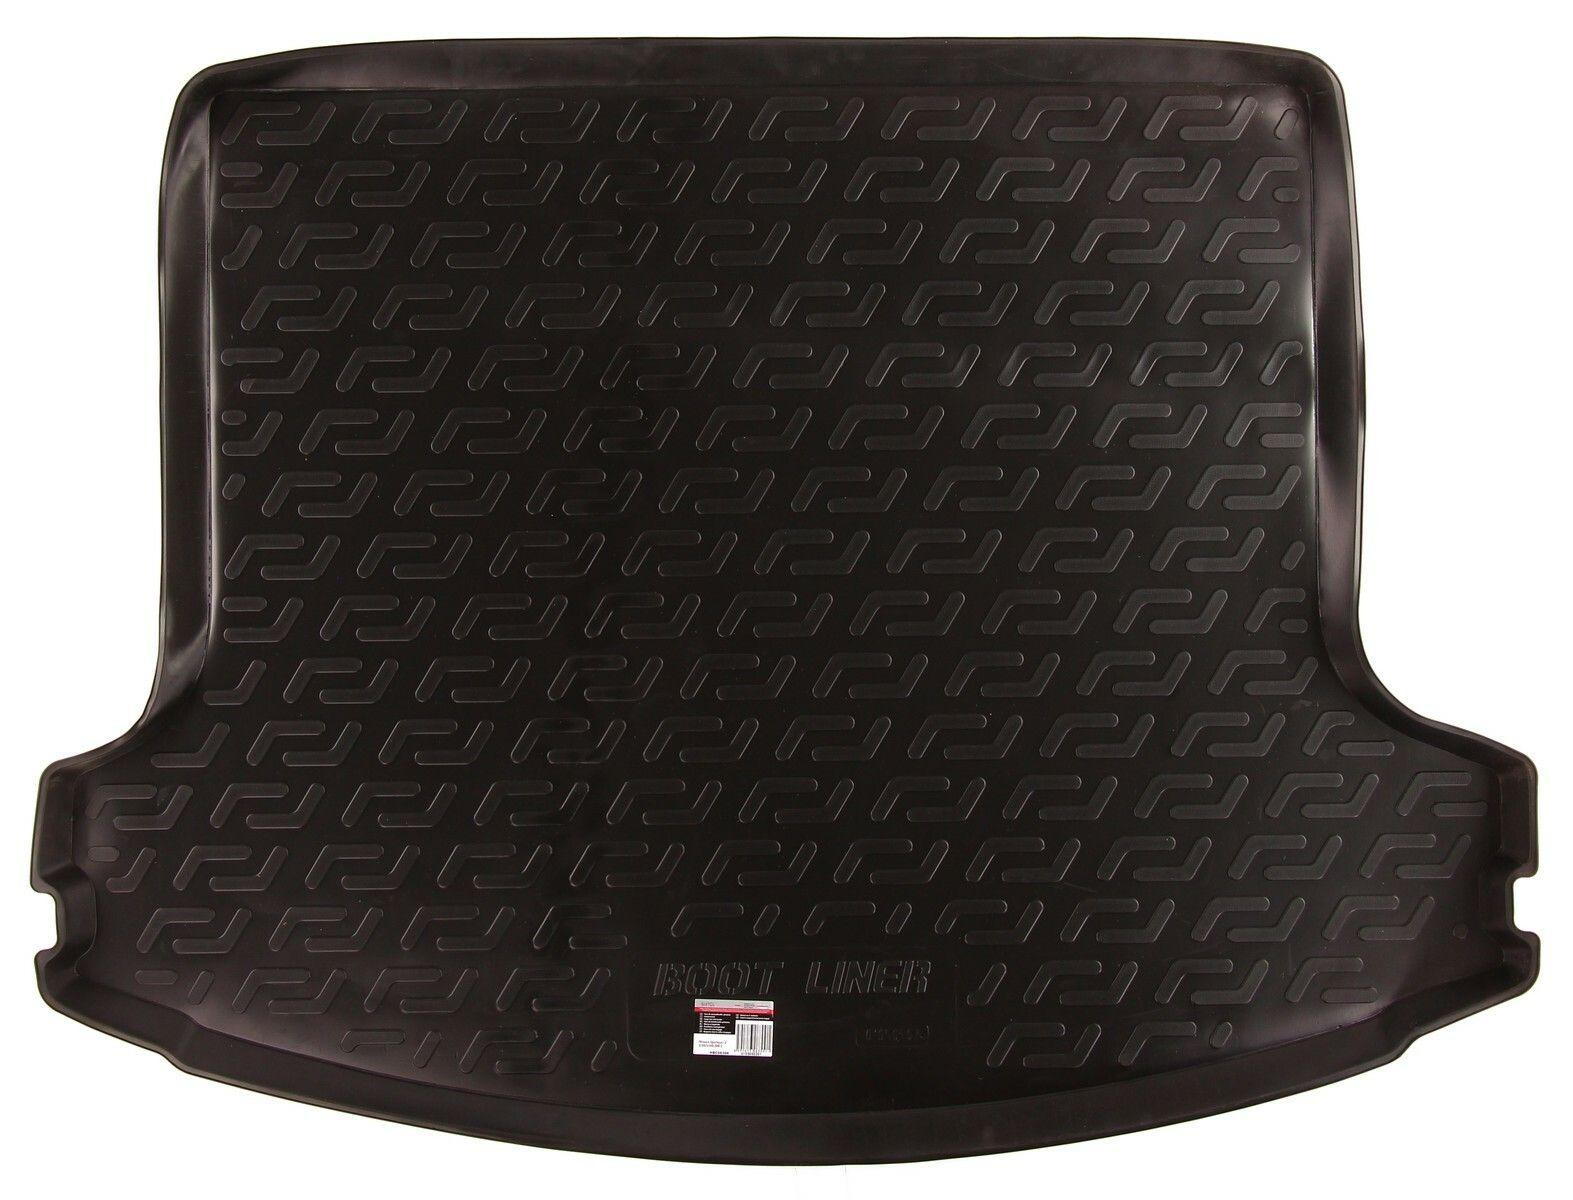 Vana do kufru gumová Nissan Qashqai+2 (J10/JJ10) (08-) SIXTOL